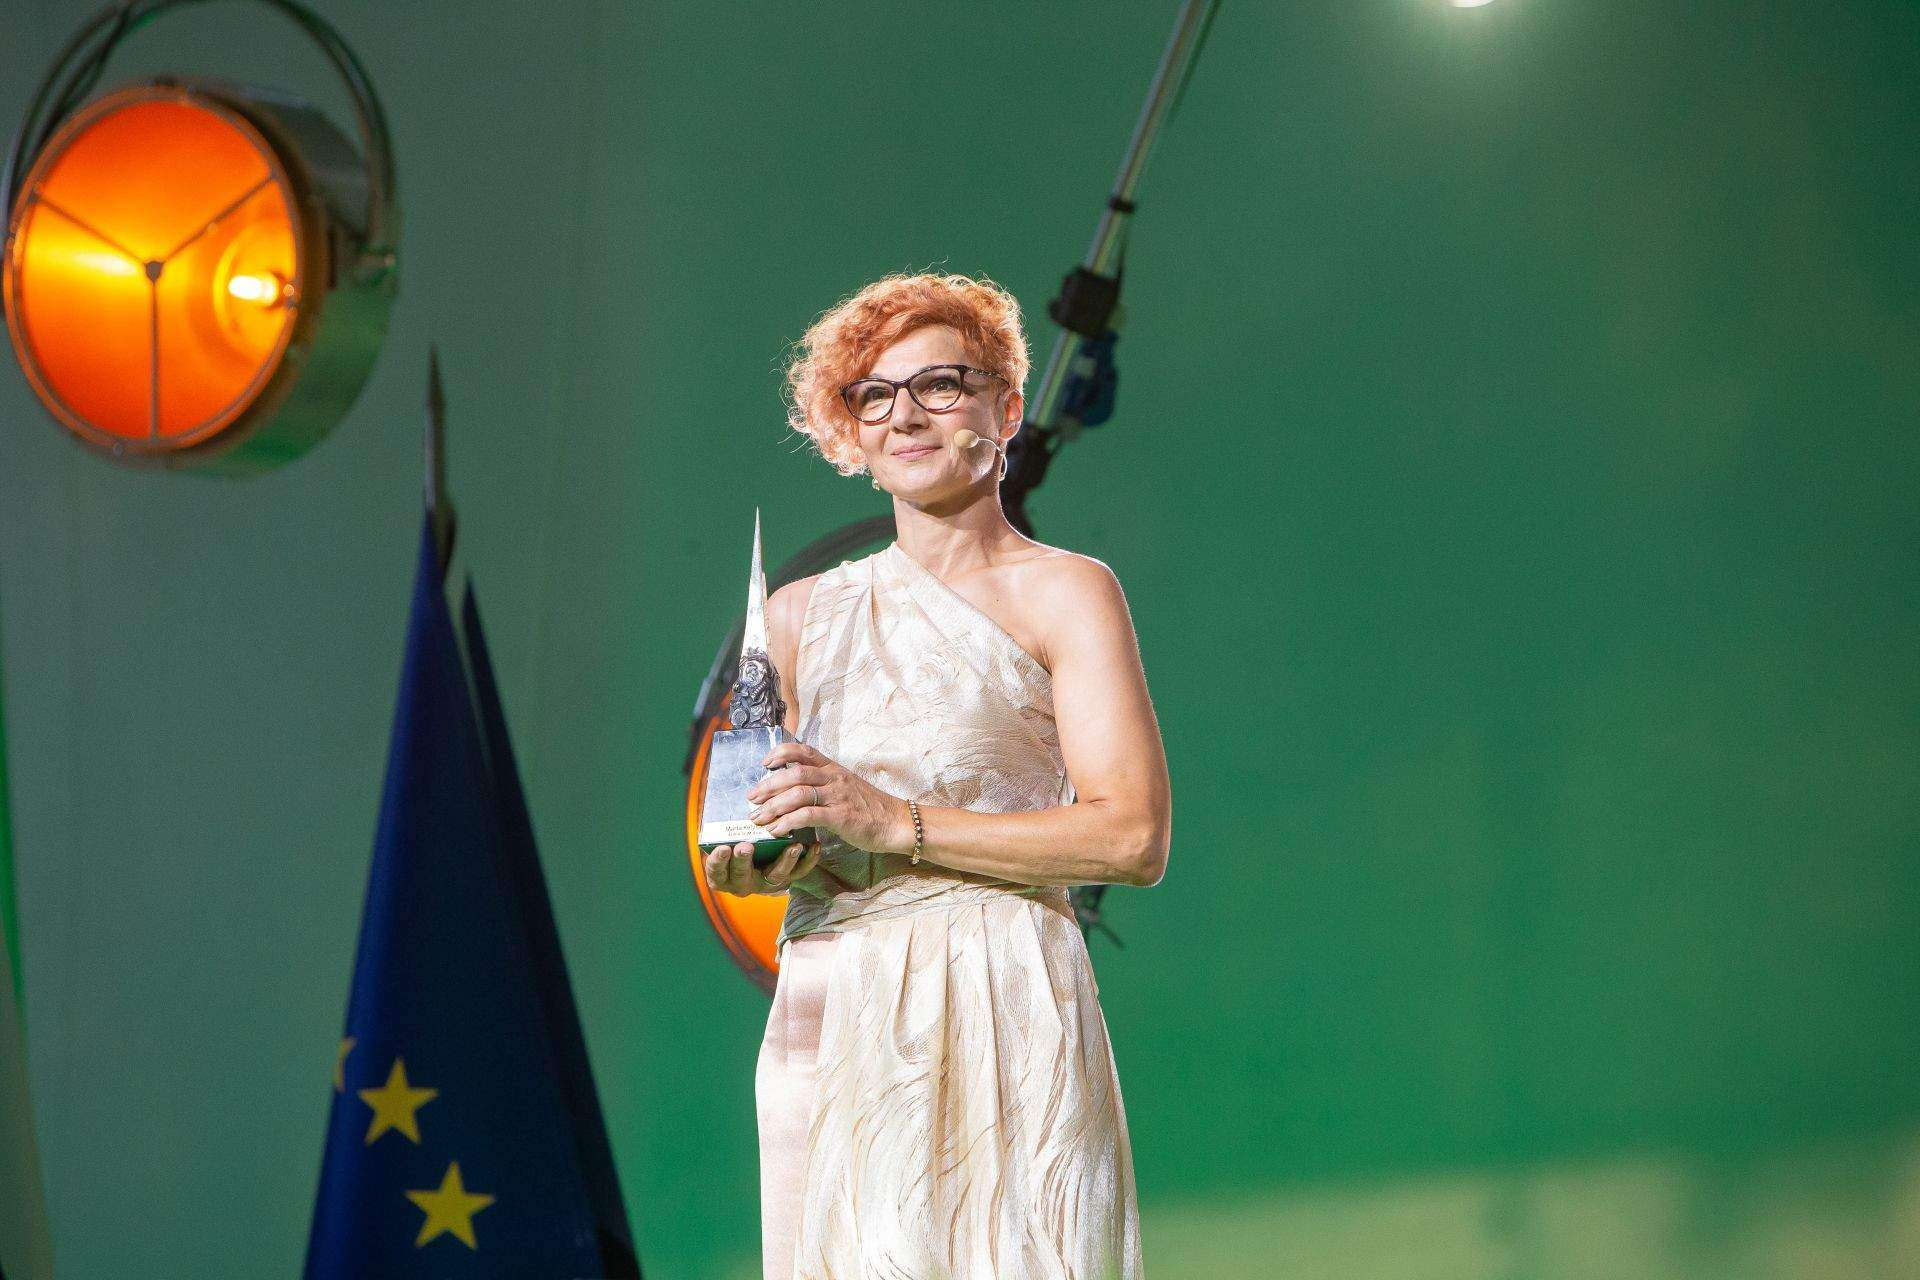 Economic Oscar for Managing Director Mrs. Marta Kelvišar!